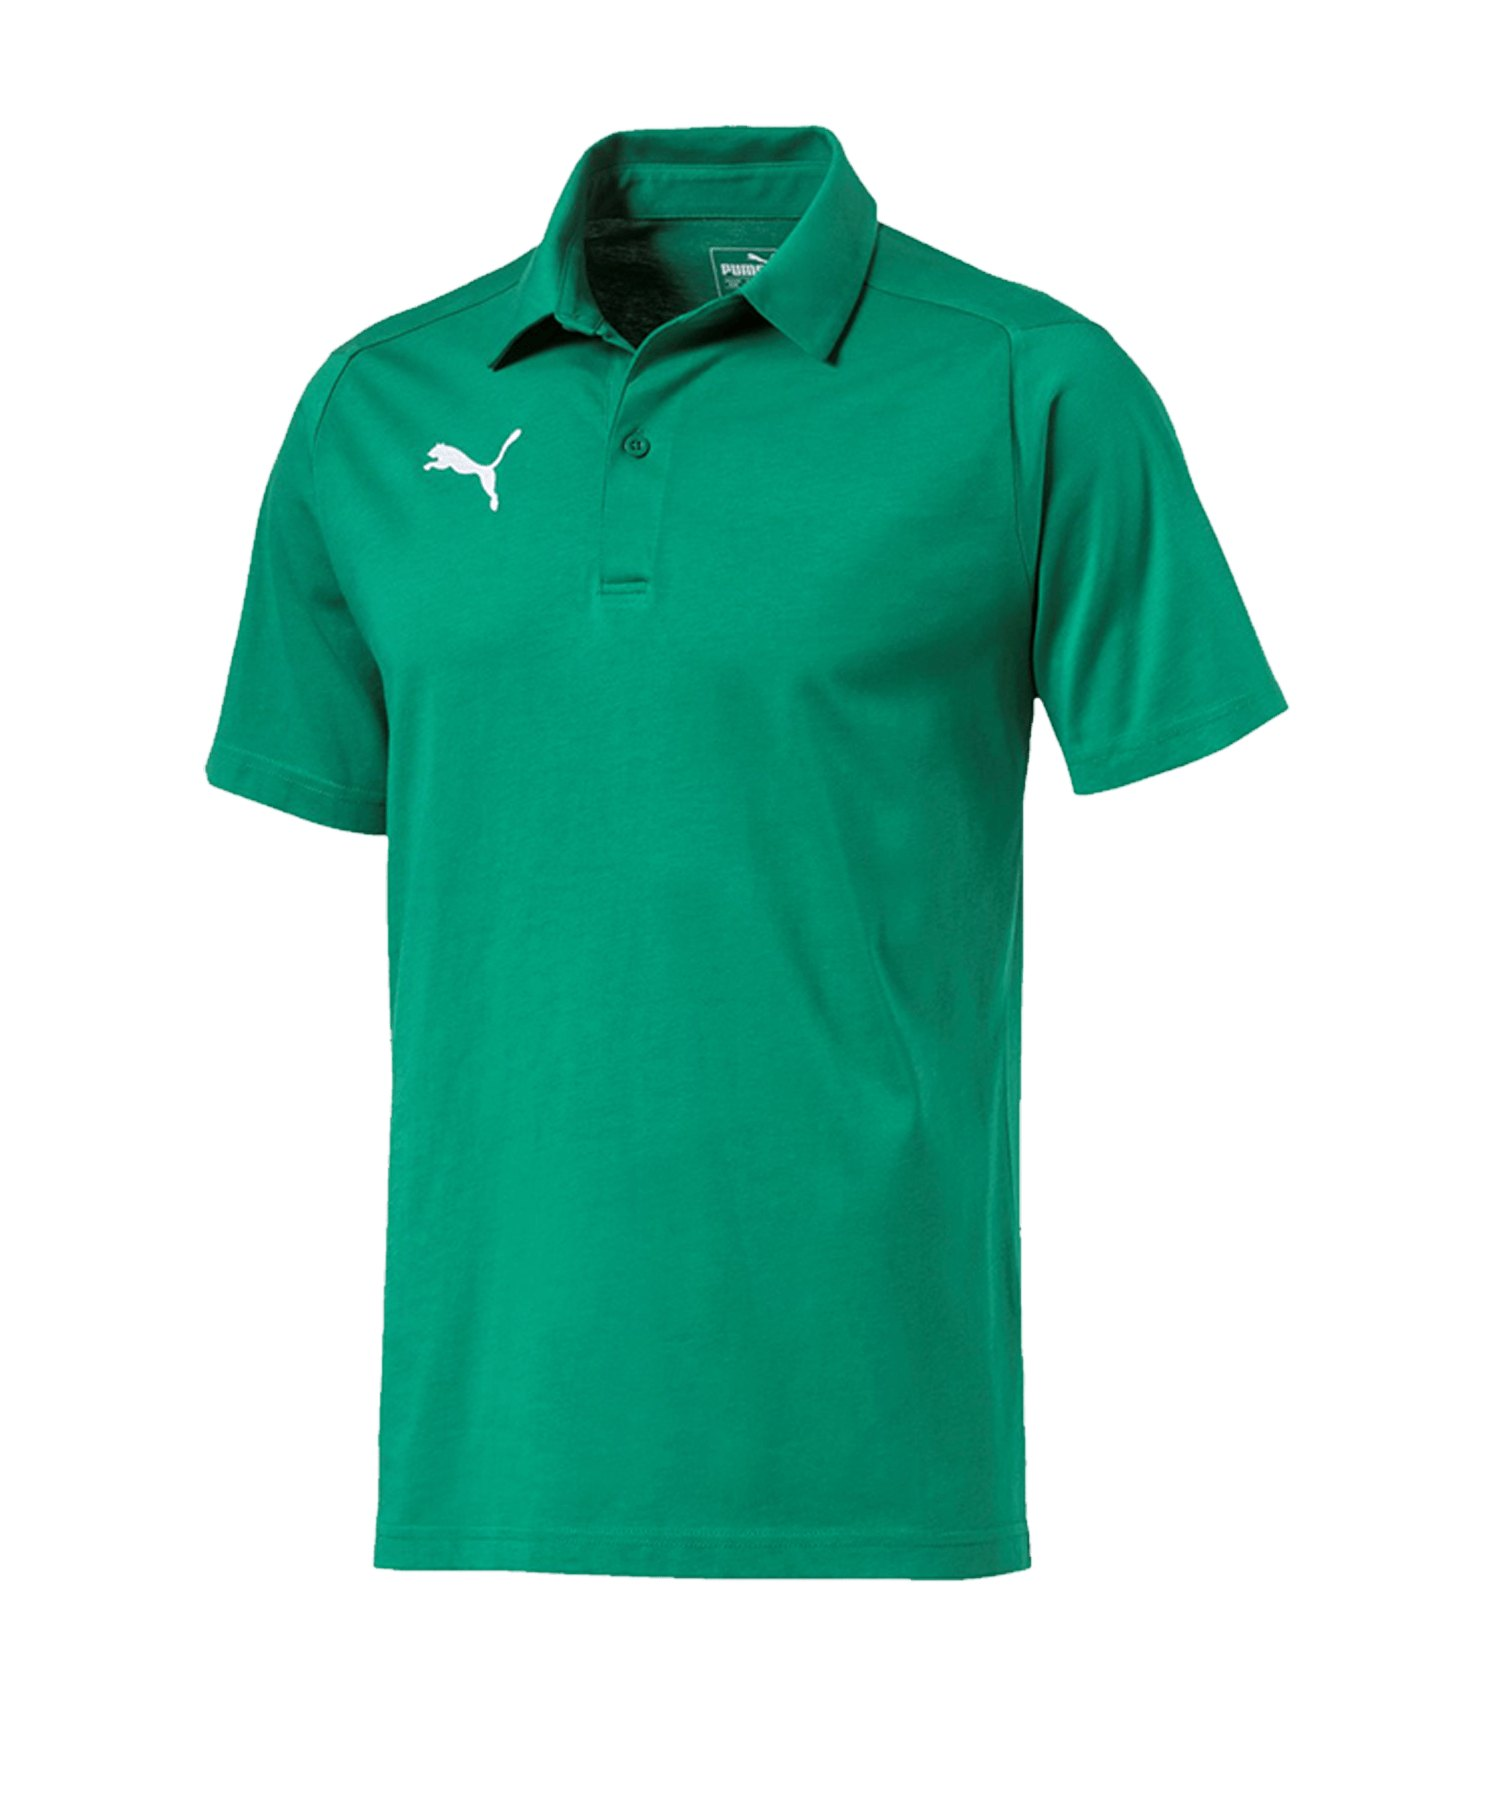 PUMA LIGA Casuals Poloshirt Grün F05 - gruen